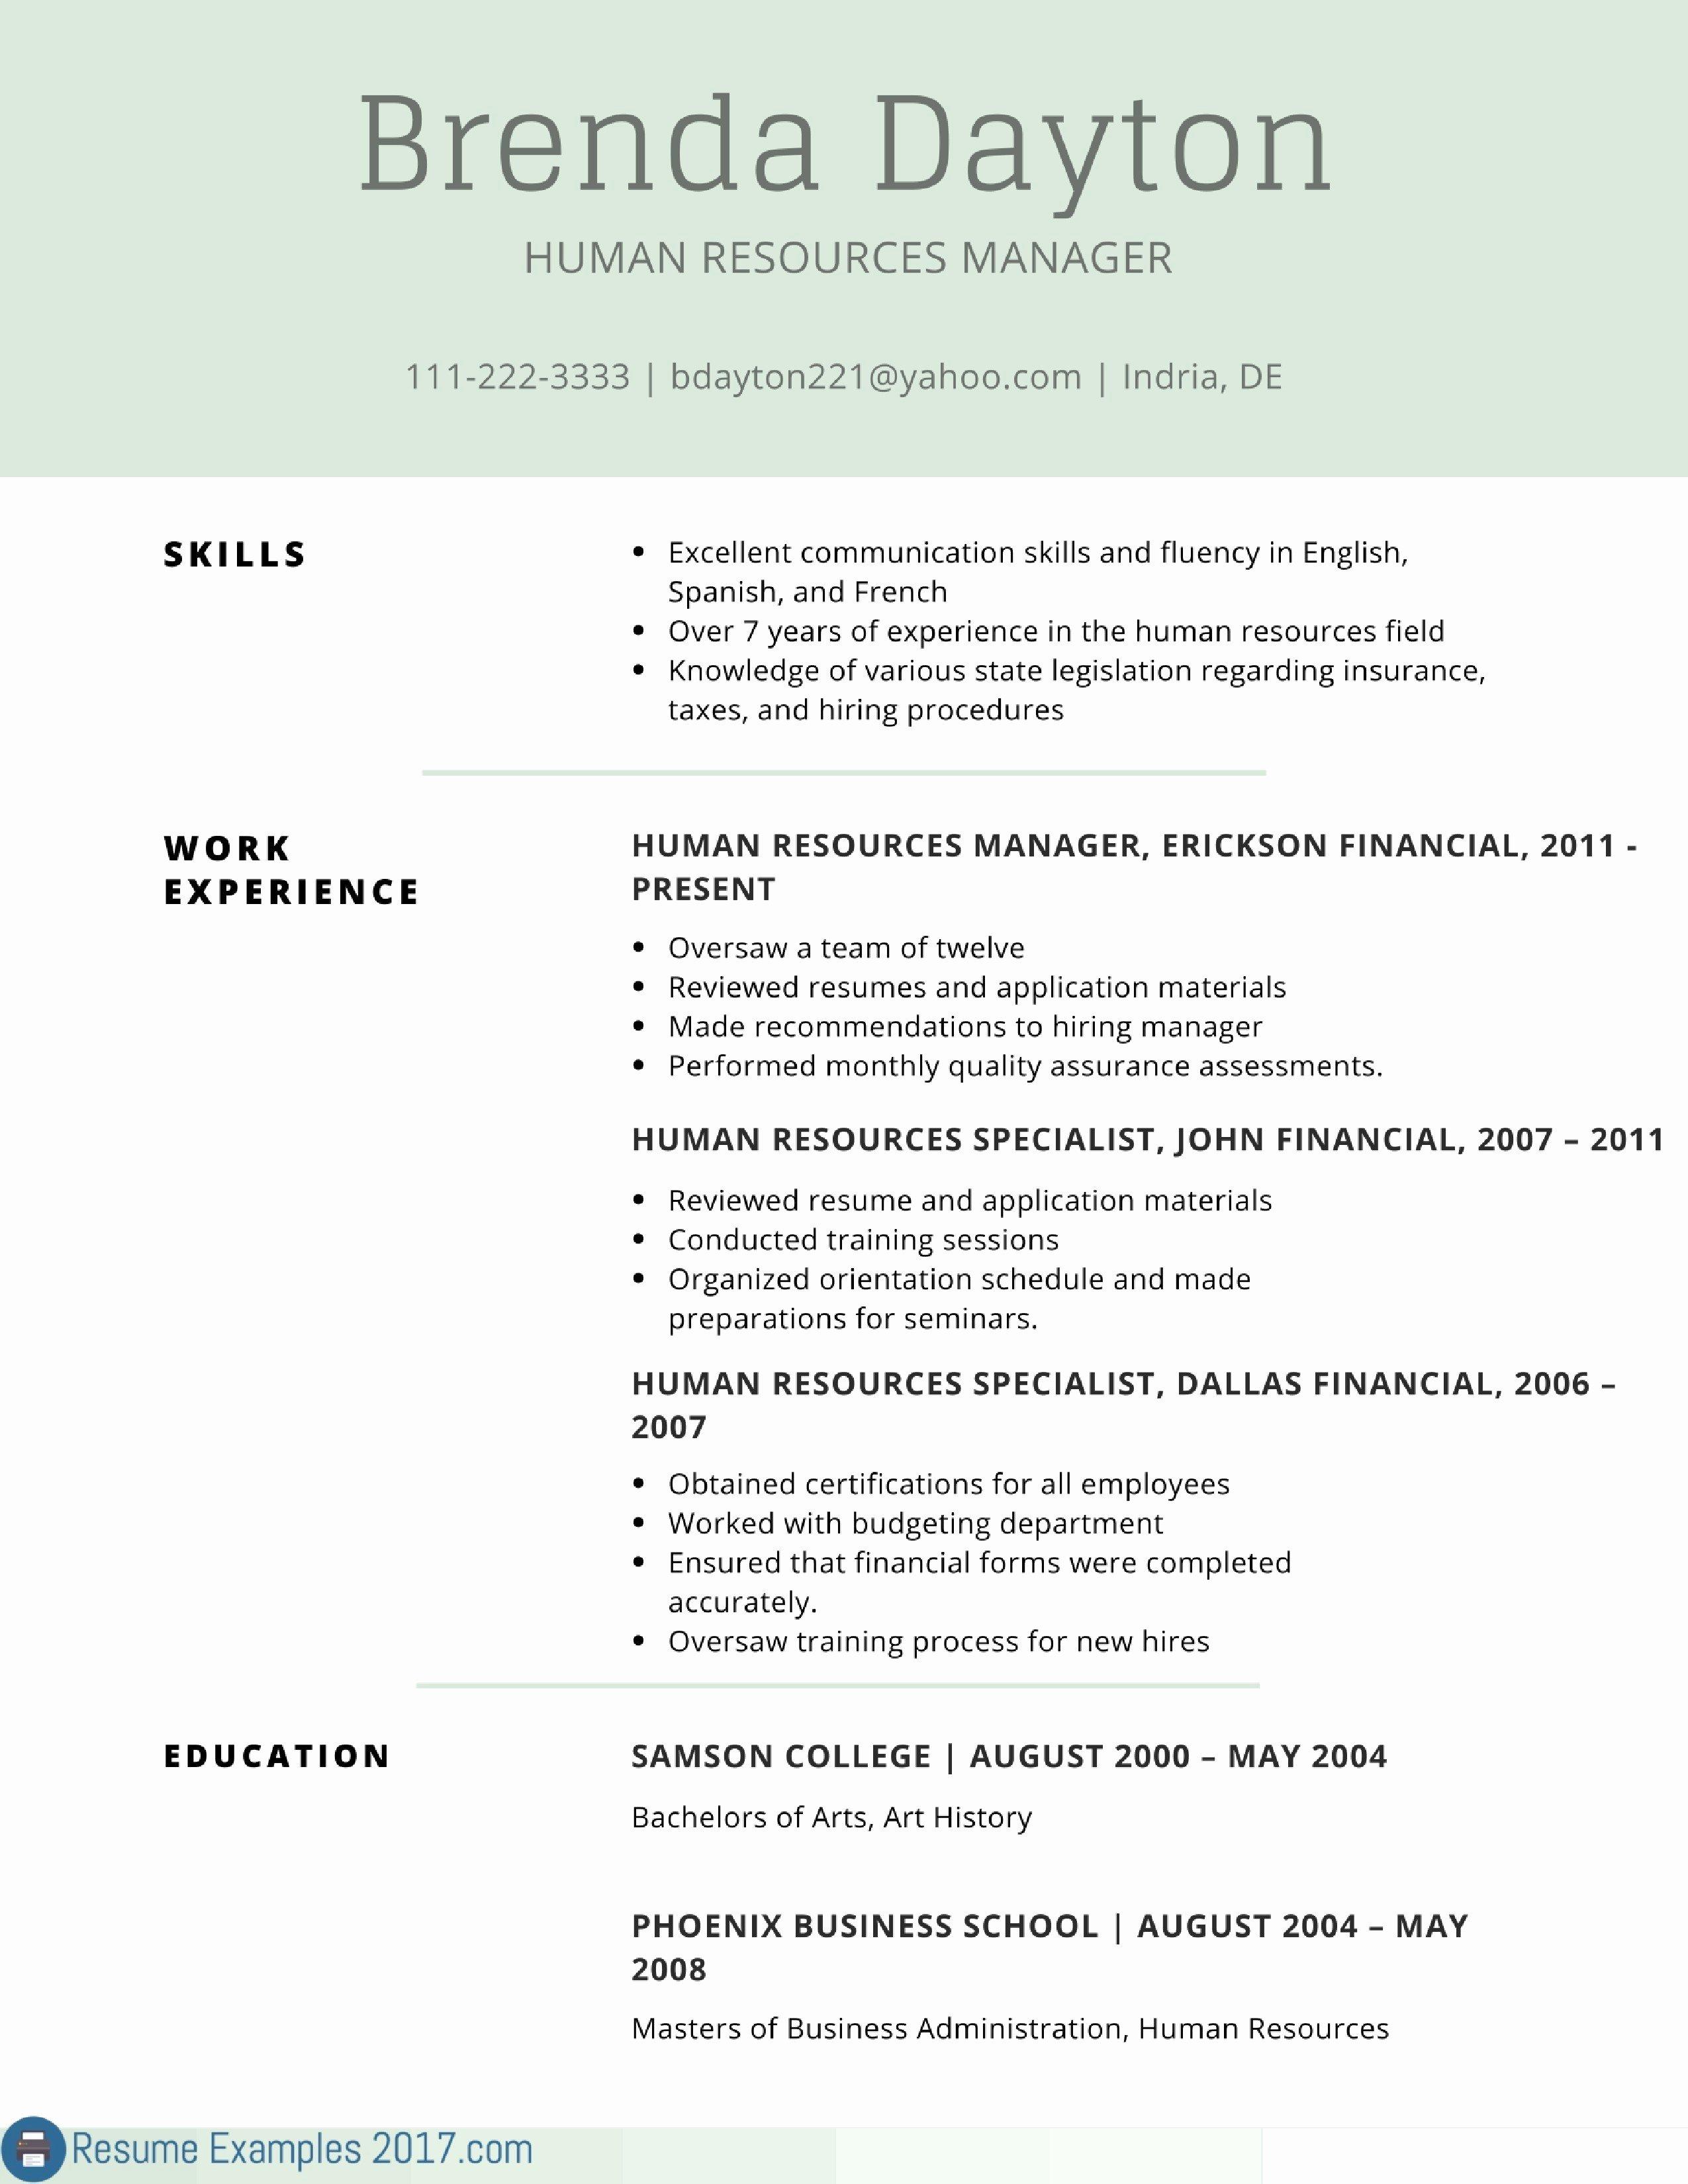 Graduate Nurse Resume Template New Resume for Fresh Graduate Nursing New Rn Resume Examples